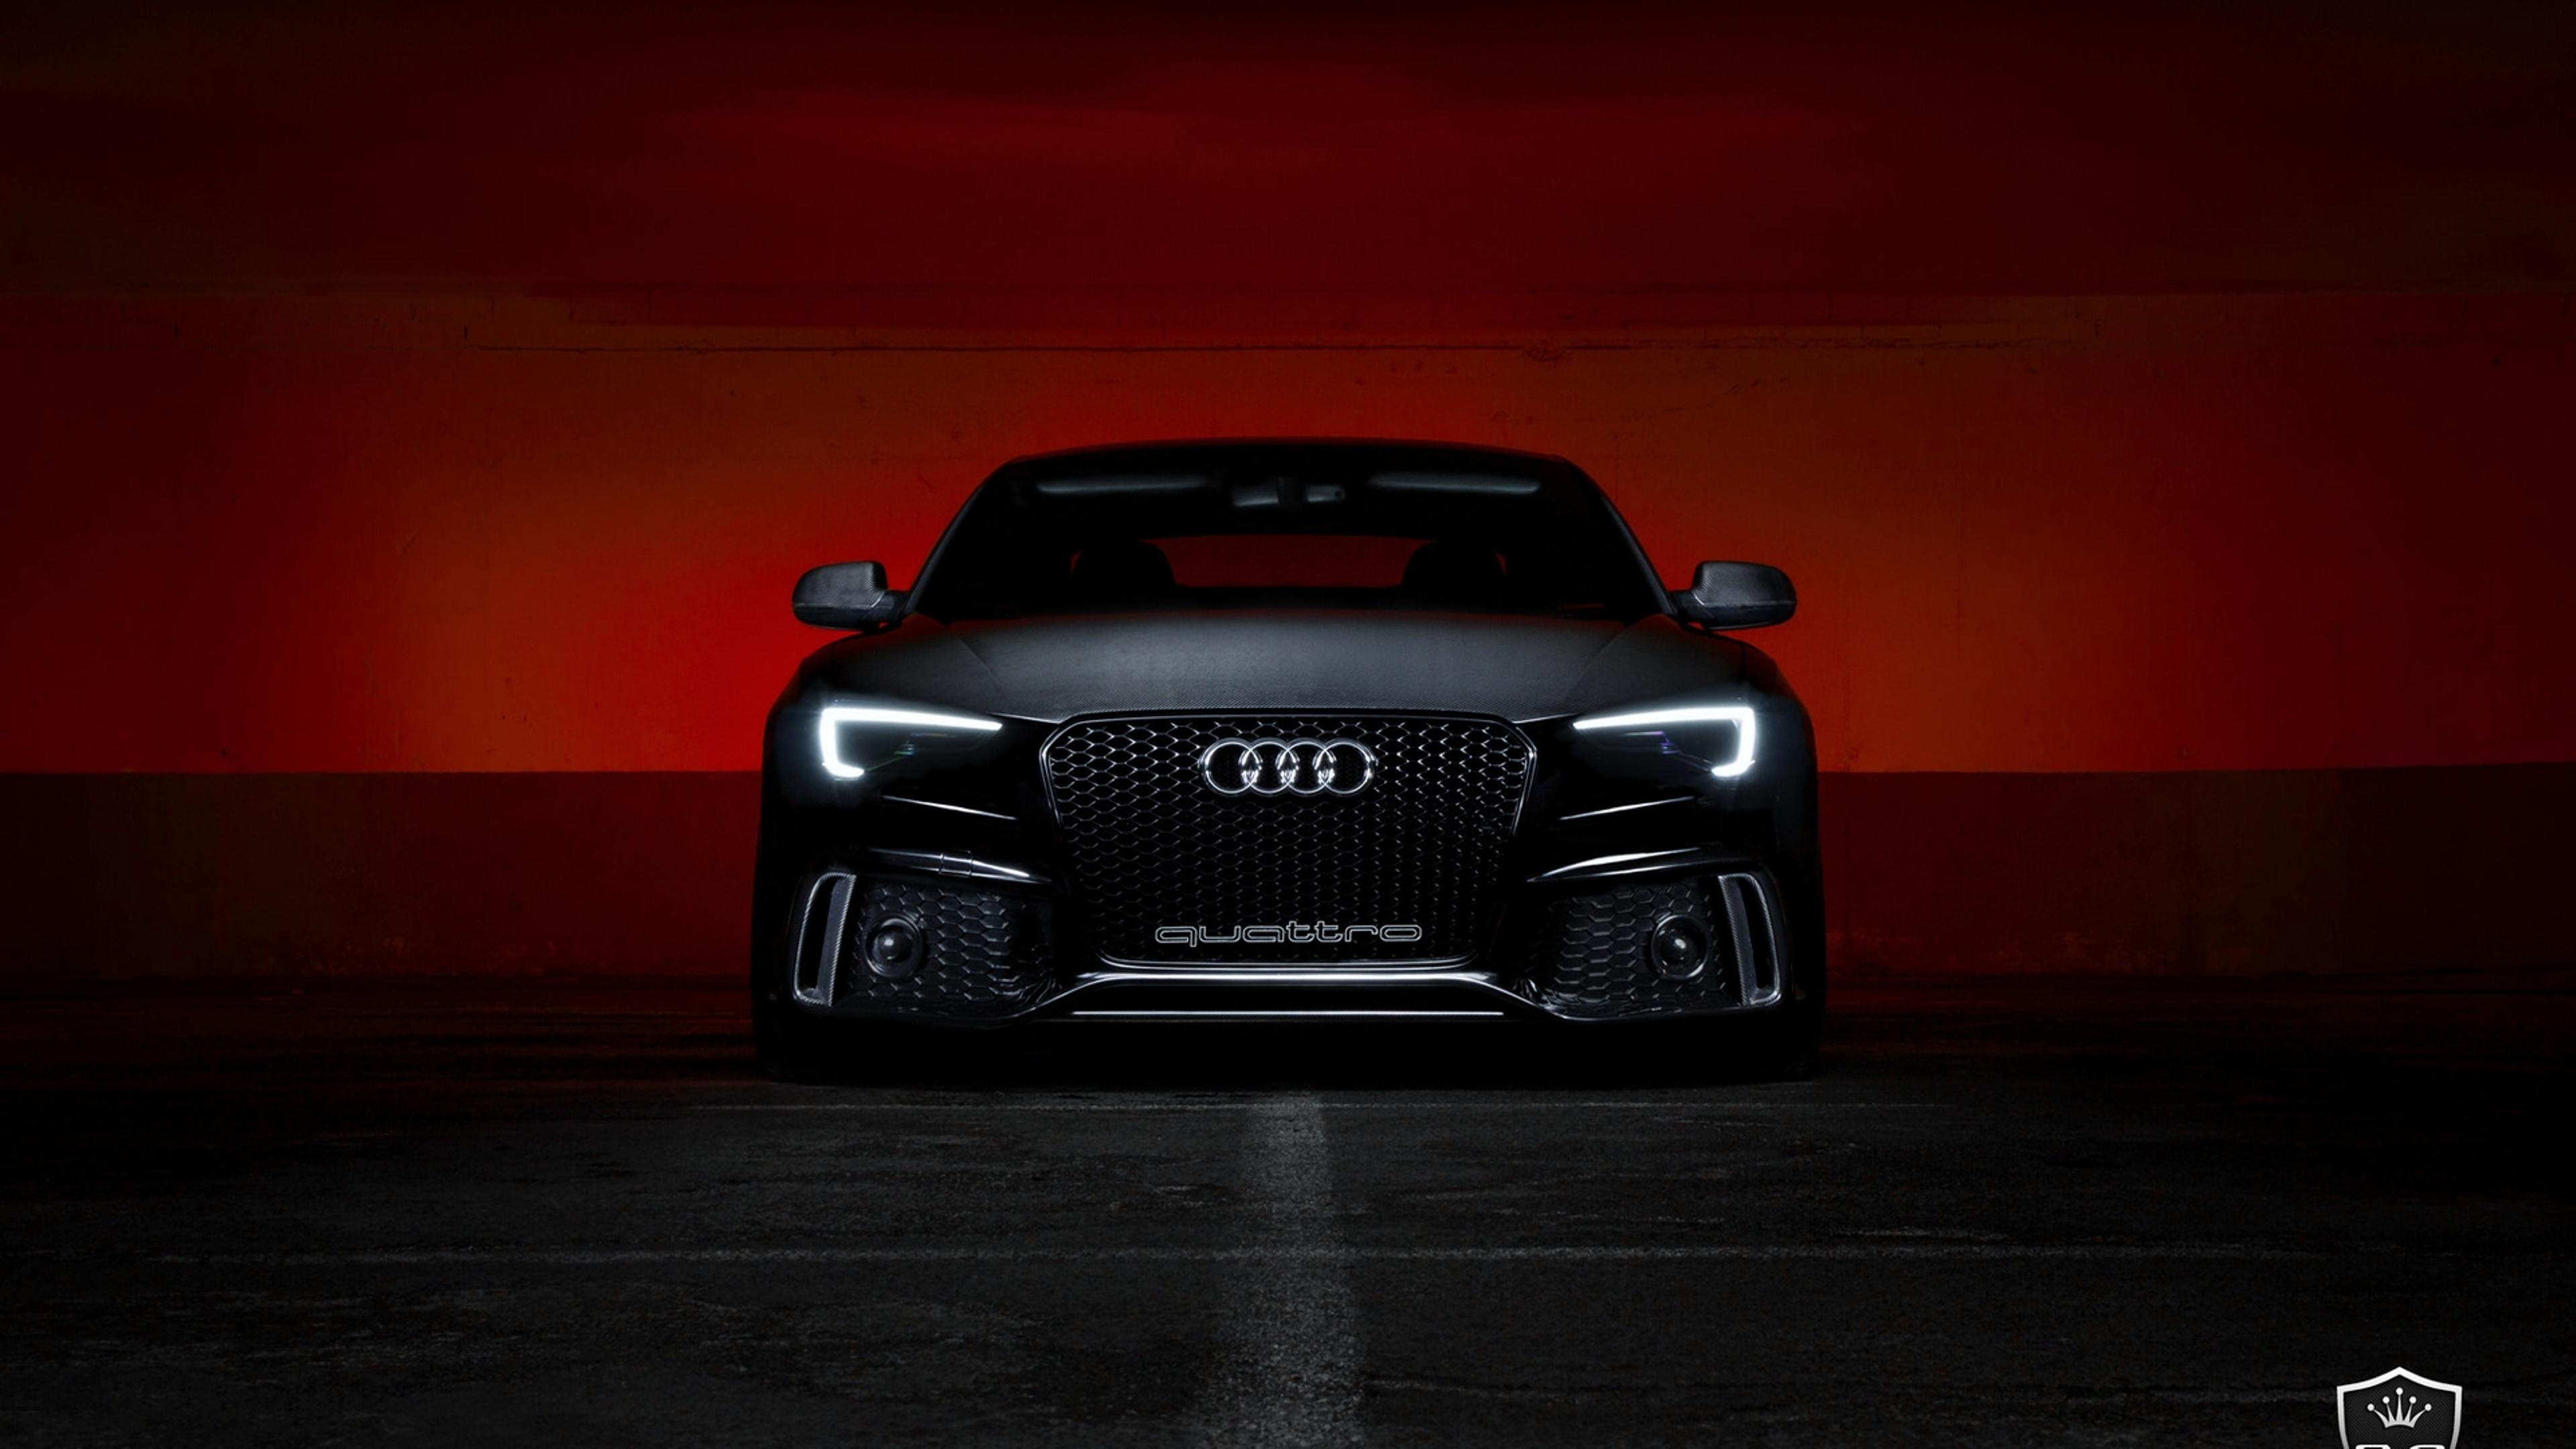 Black Audi S5 Front View - Dark wallpaper Wallpaper ...